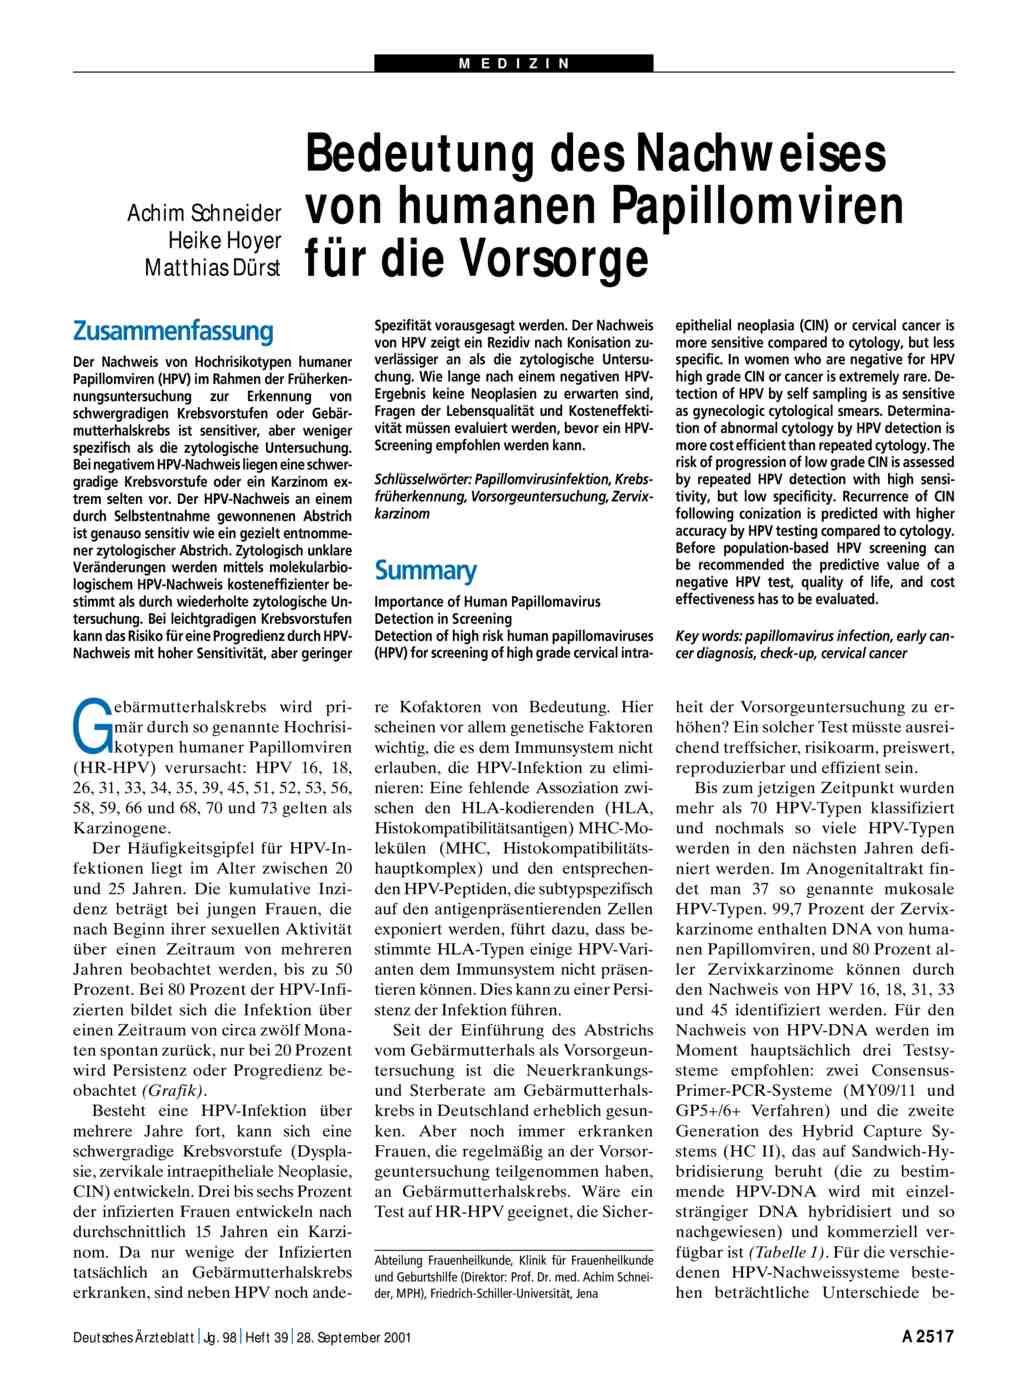 papilloma vírus pcr pozitív nyelőcső pikkelyes papilloma kezelés